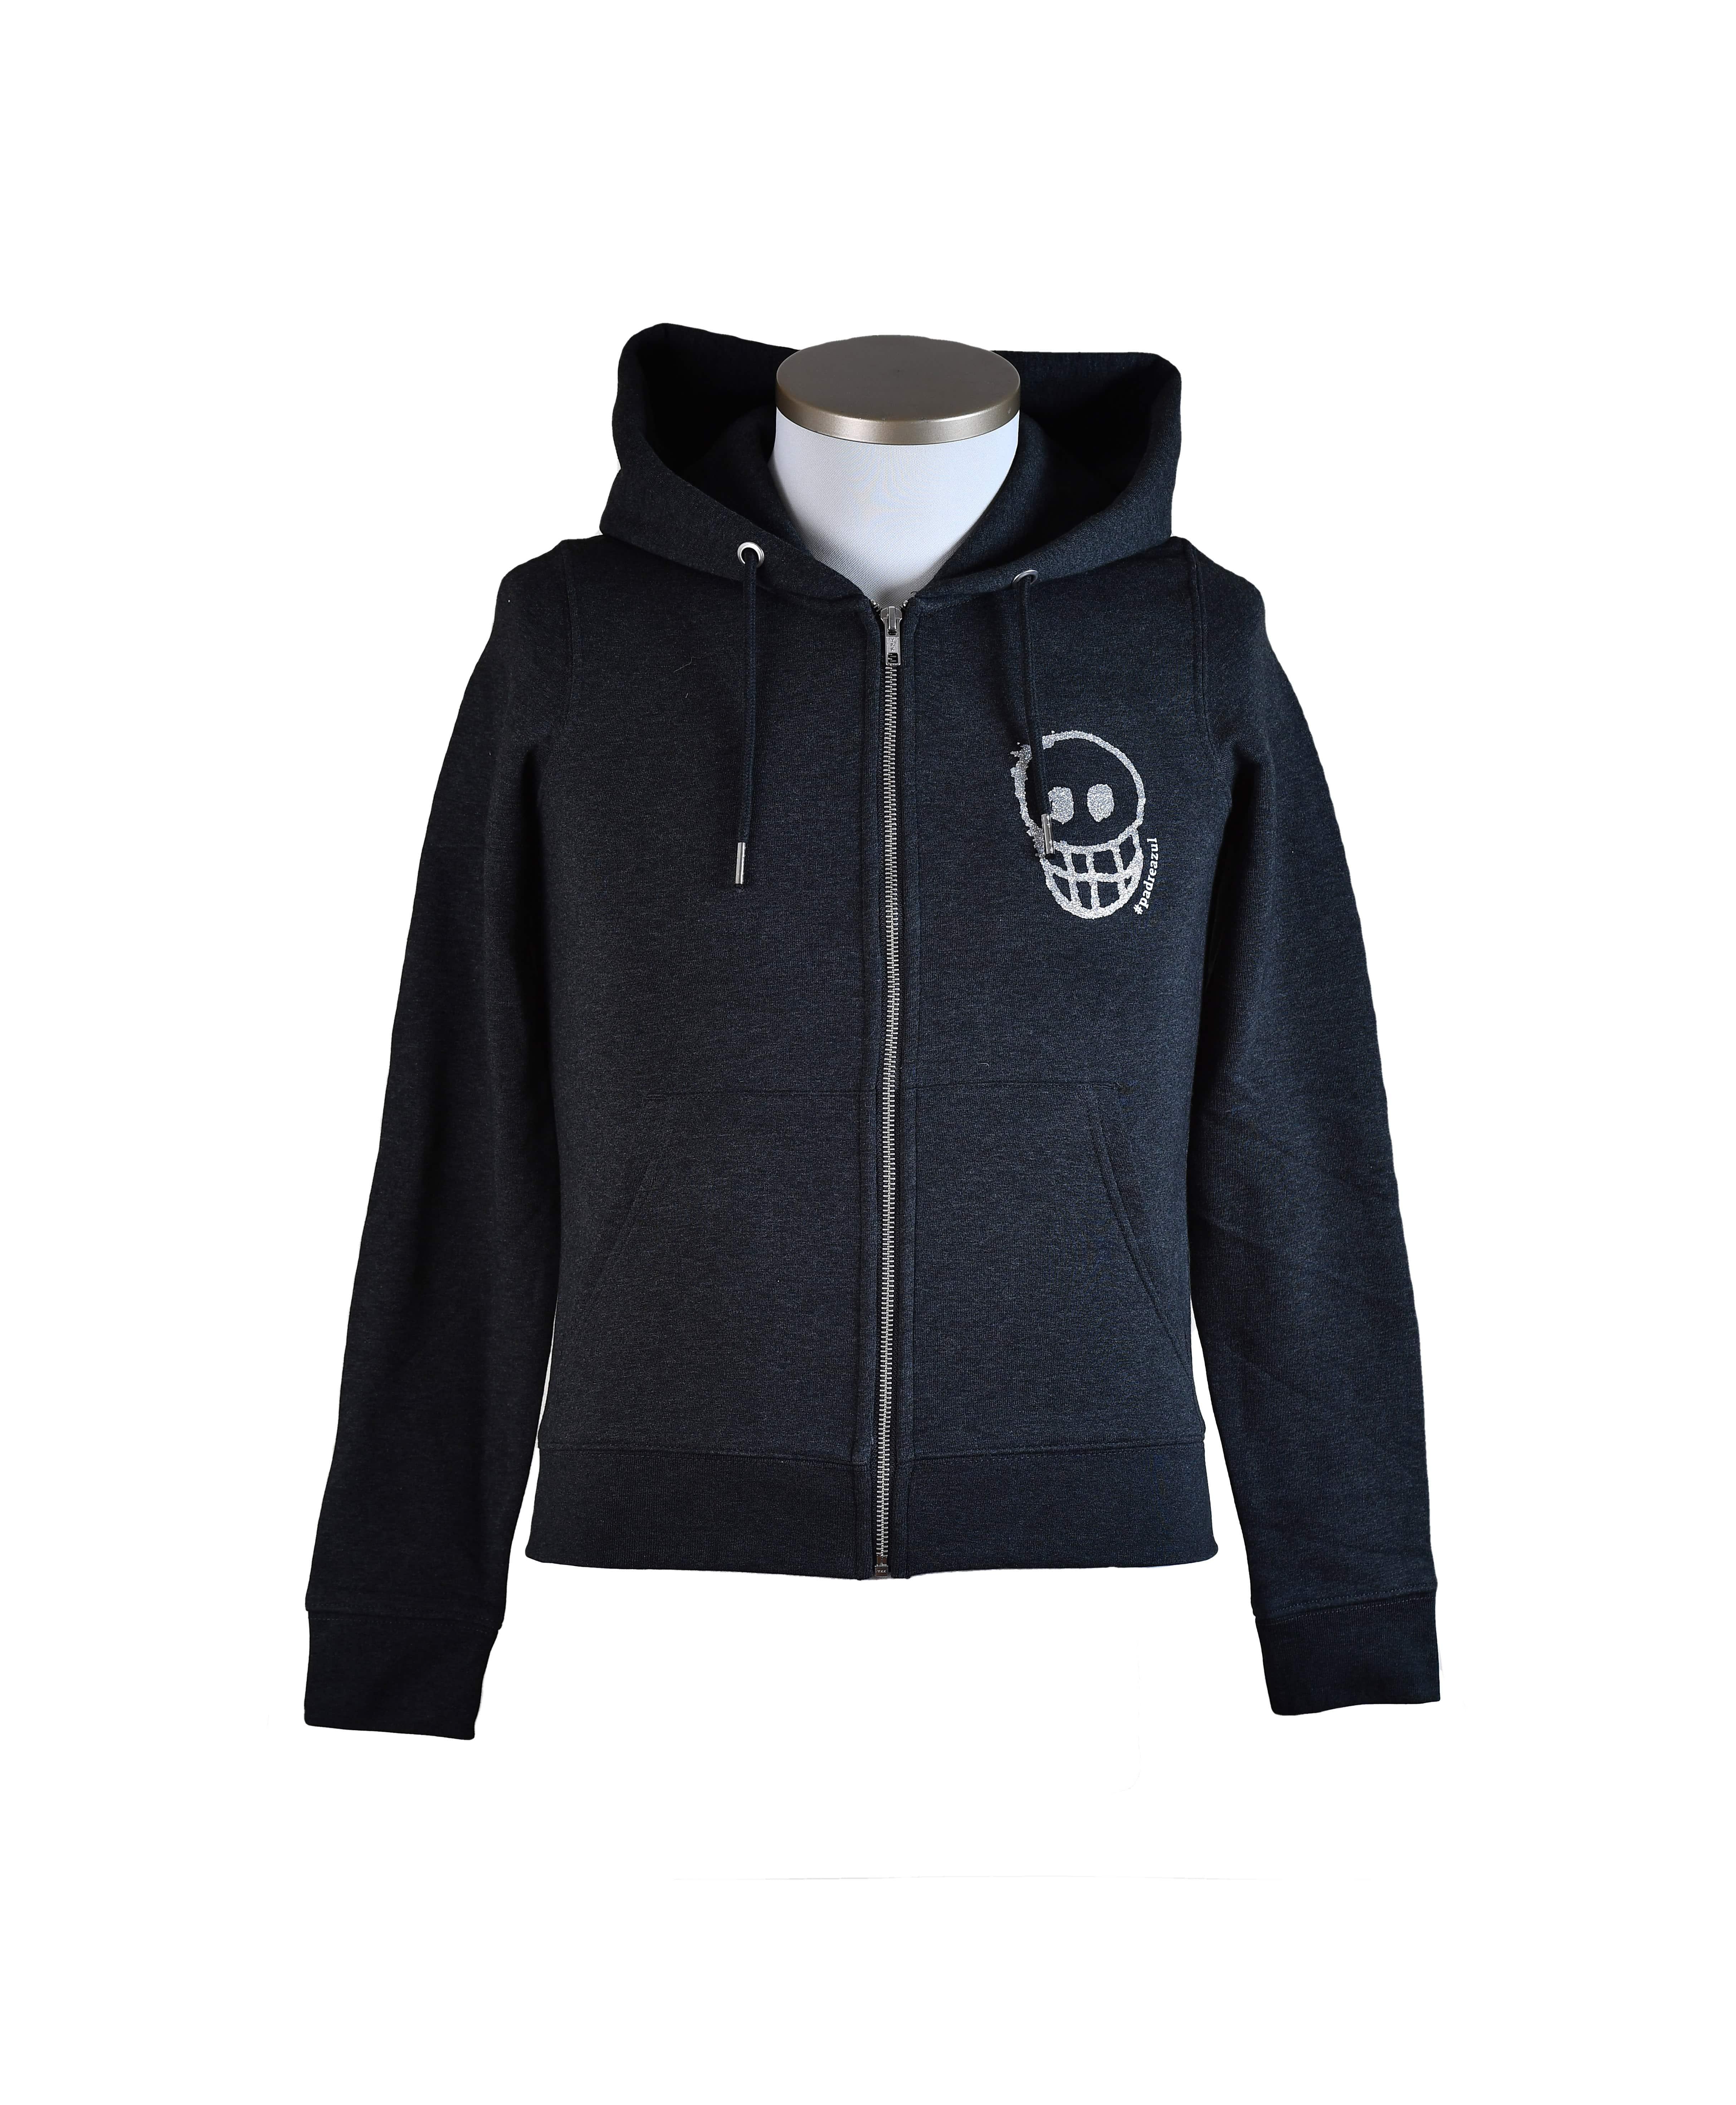 Short Ramon zip jacket